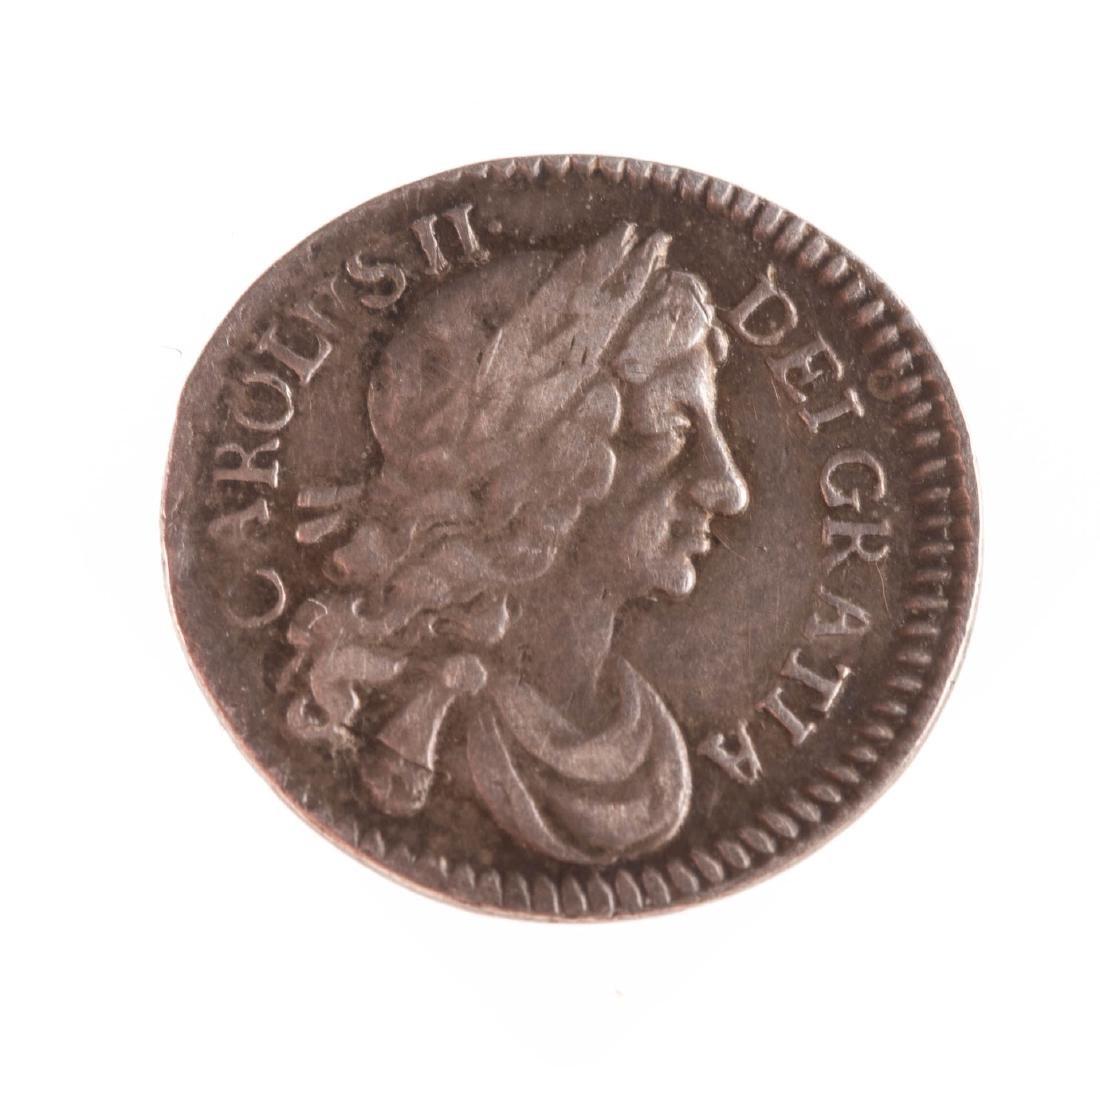 [World] 1684 Charles II Silver Maundy 2 Pence XF